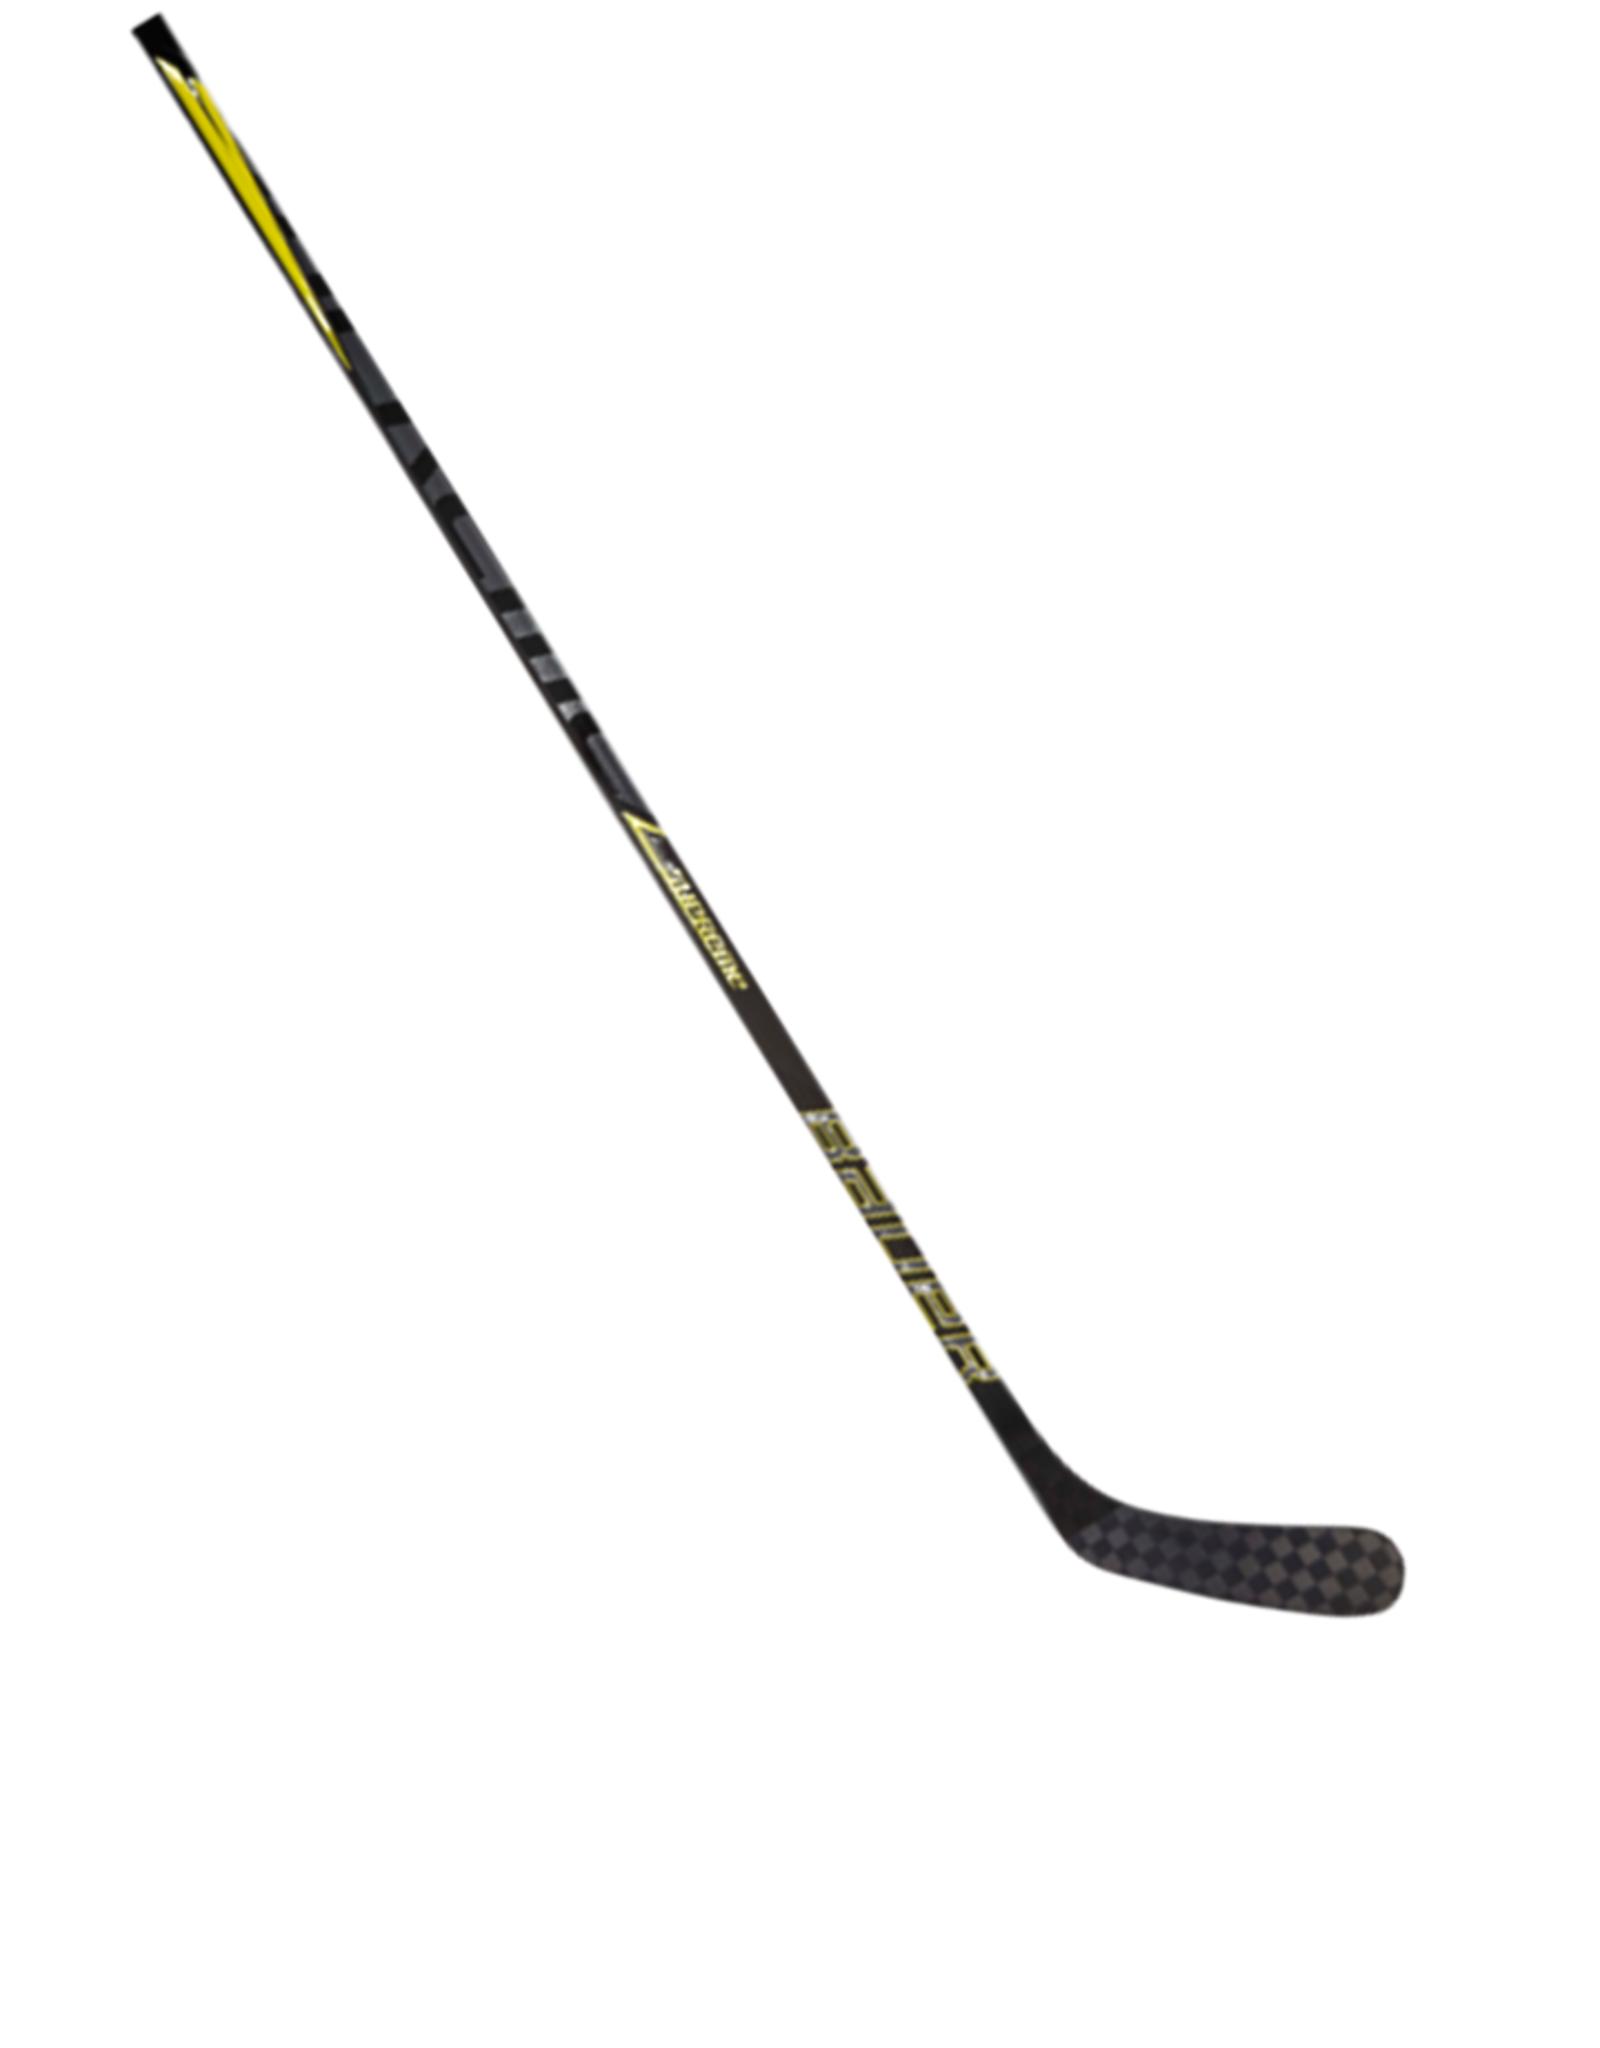 Bauer Supreme 3S Intermediate stick